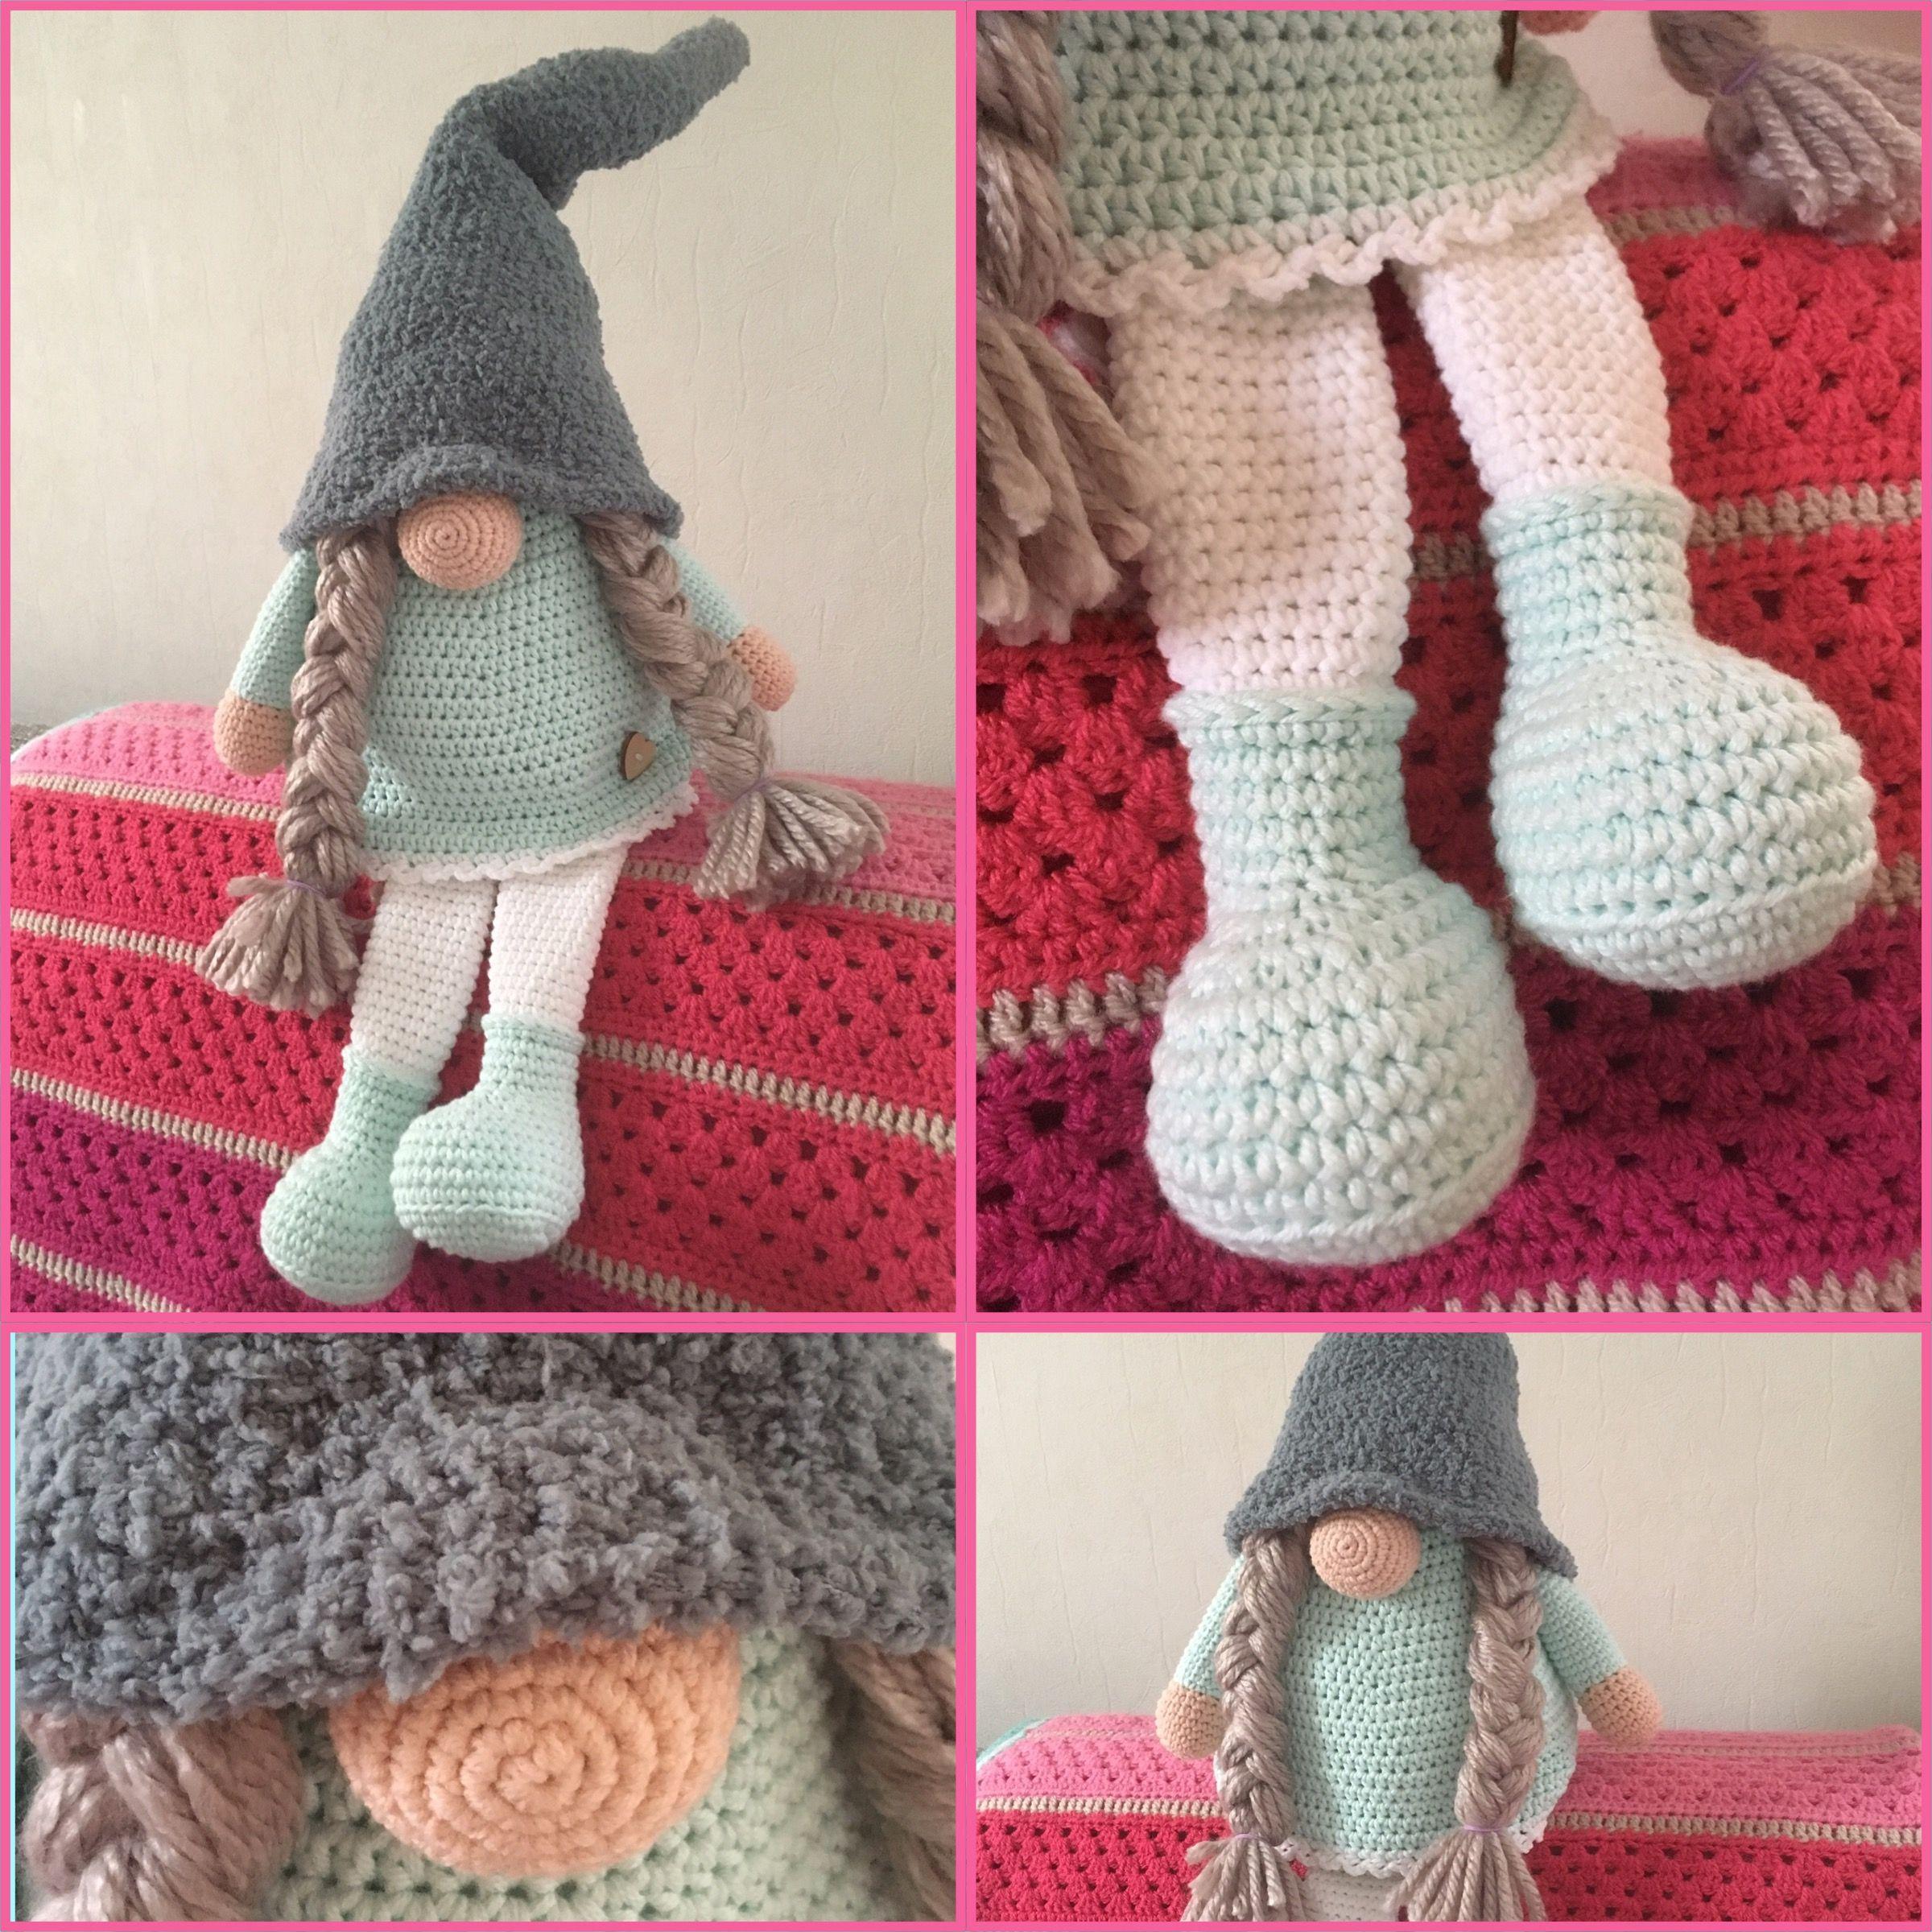 Tomte Patroon Van Cutedutch Haken Crochet Made By